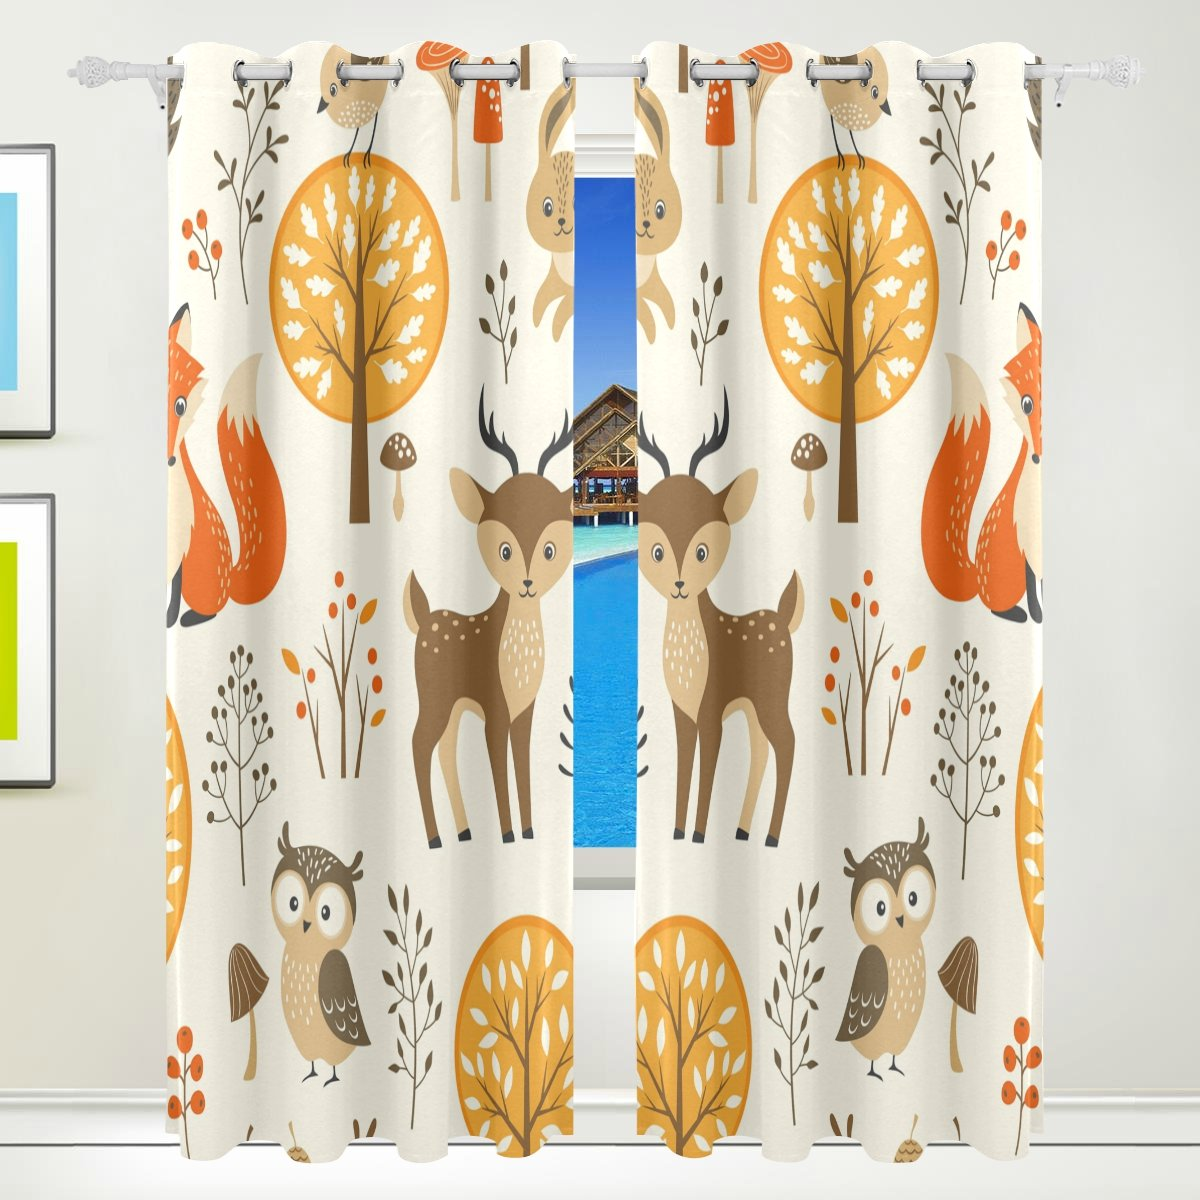 Vantaso Window Curtains 84 Inch Long Cute Animals Owls Fox Deer for Kids Girls Boys Bedroom Living Room Polyester 2 Pannels